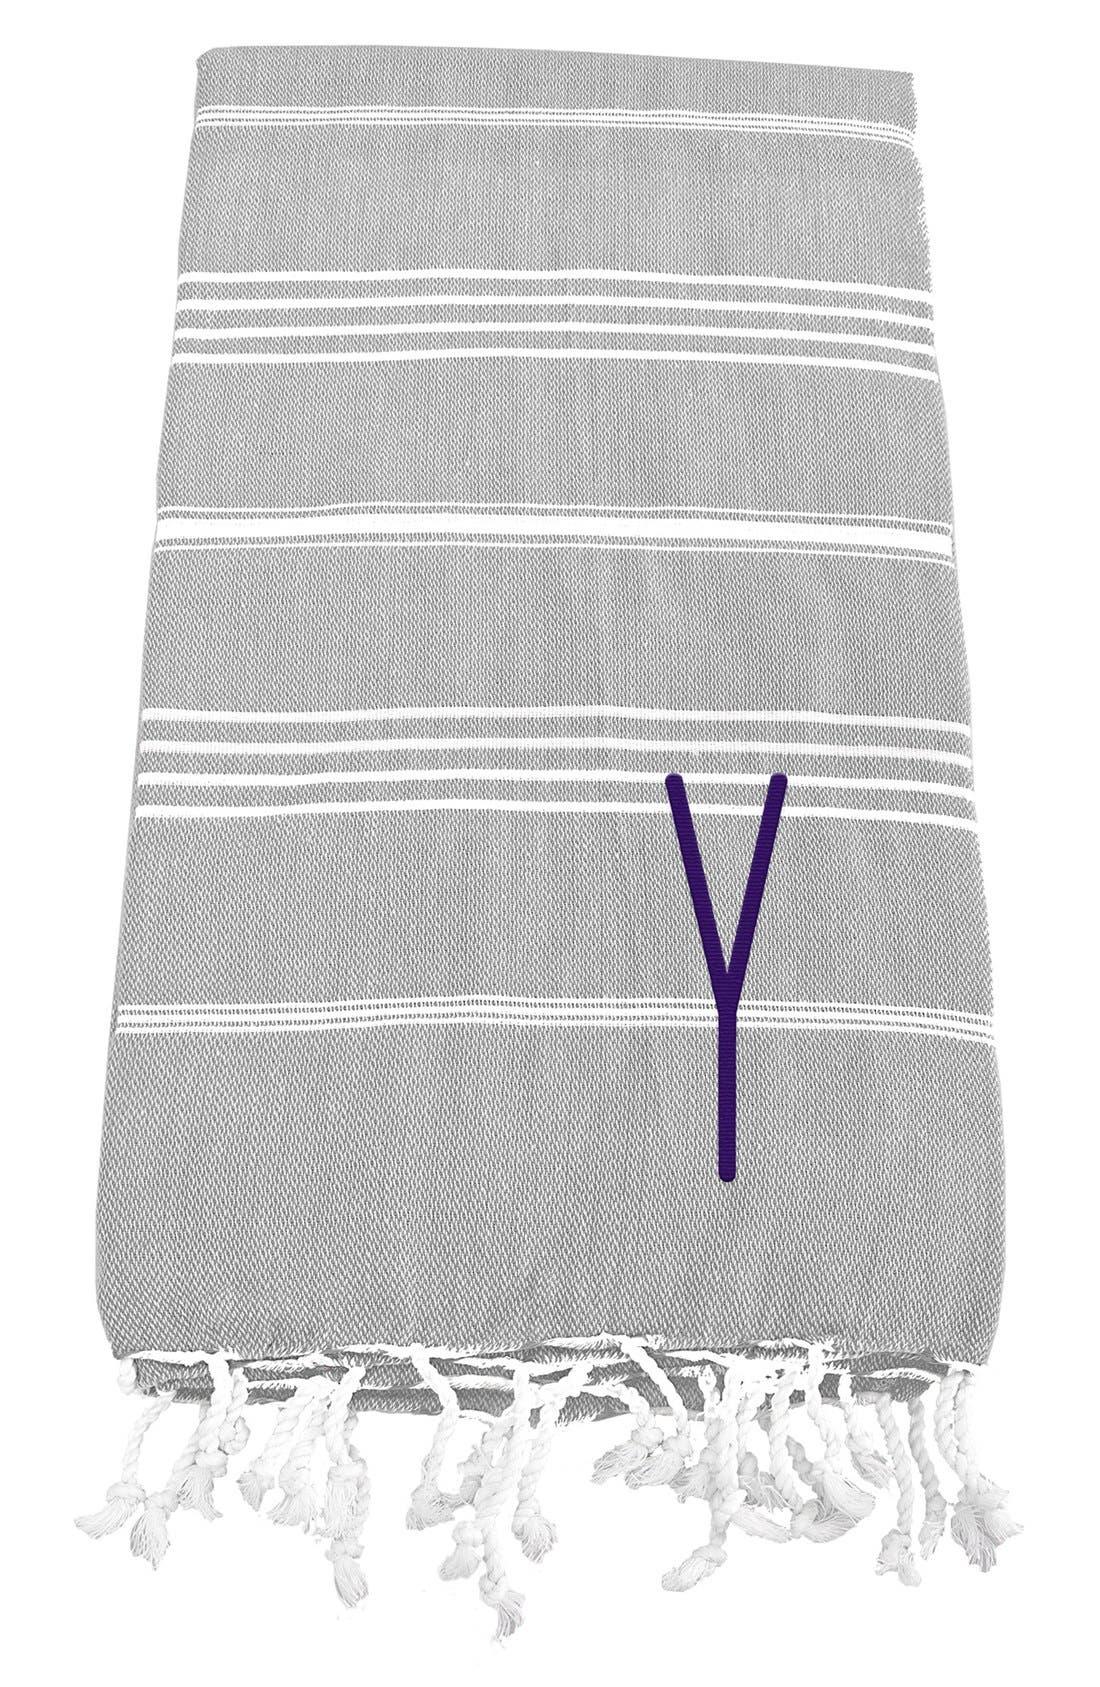 Monogram Turkish Cotton Towel,                             Main thumbnail 27, color,